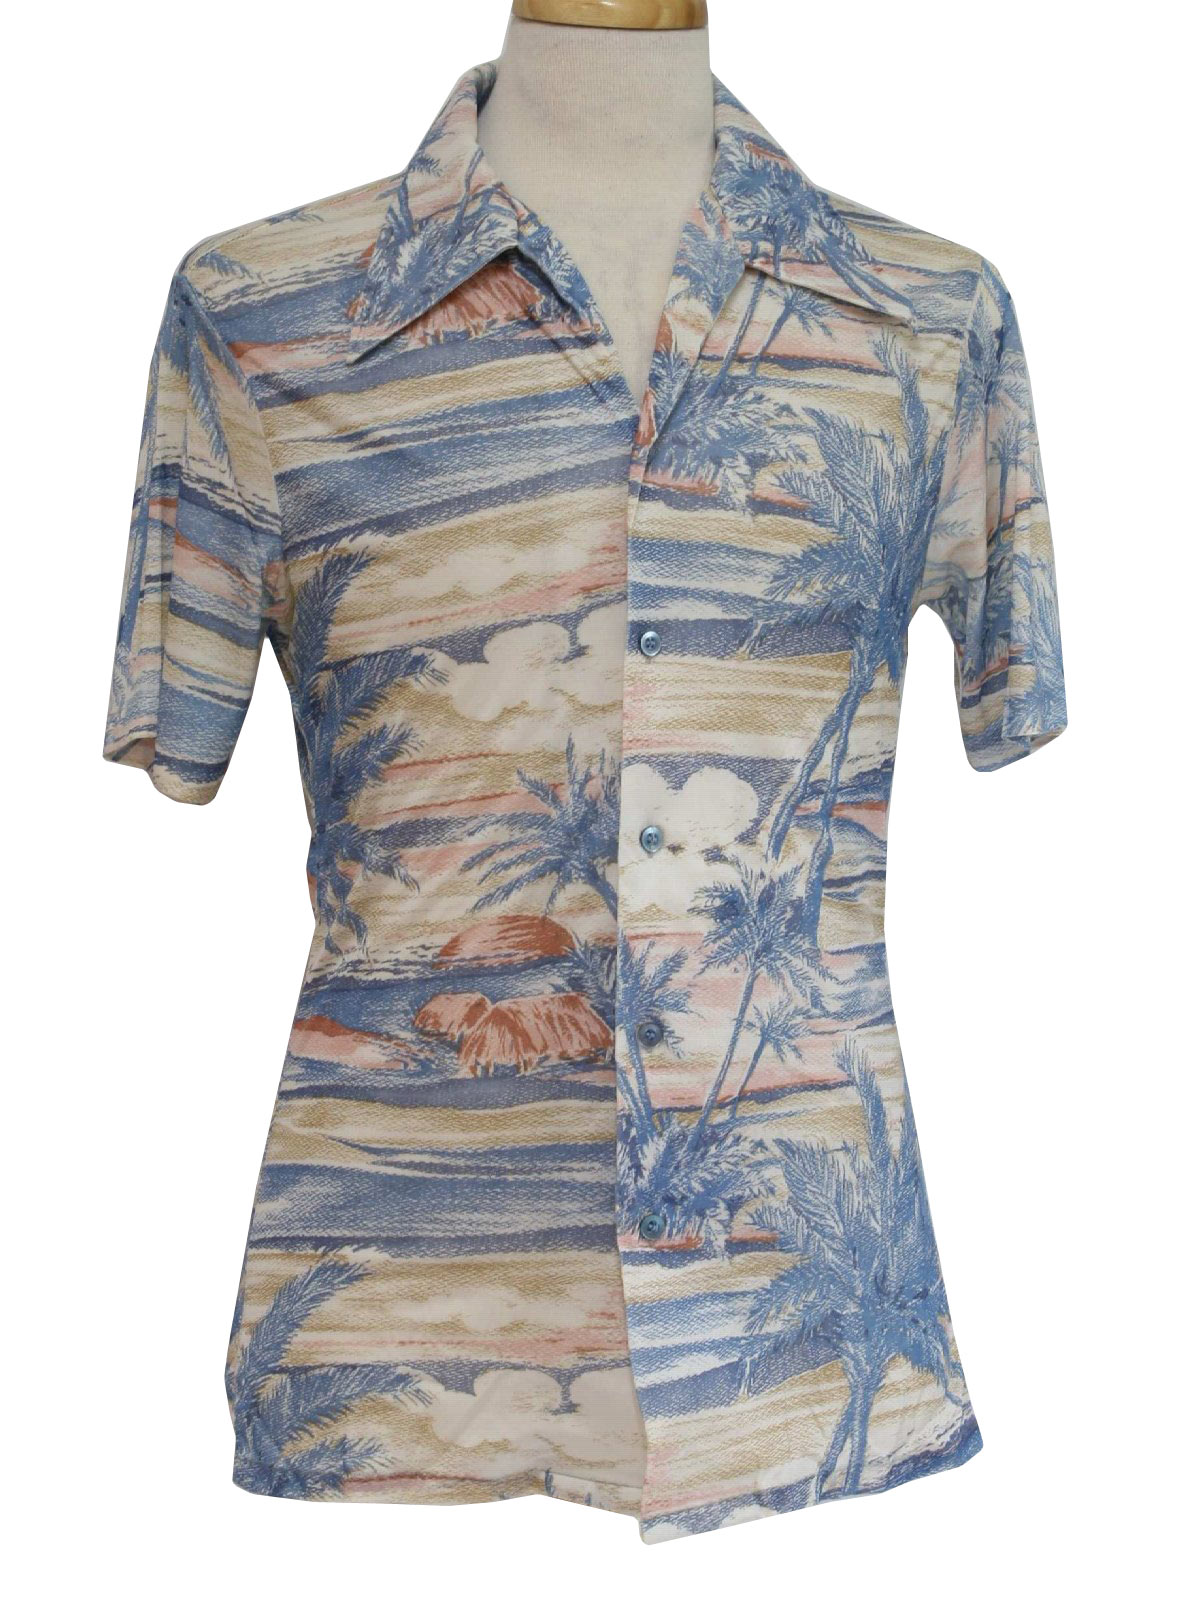 Vintage 1970 39 s print disco shirt 70s kmart mens off for Kmart button up shirts